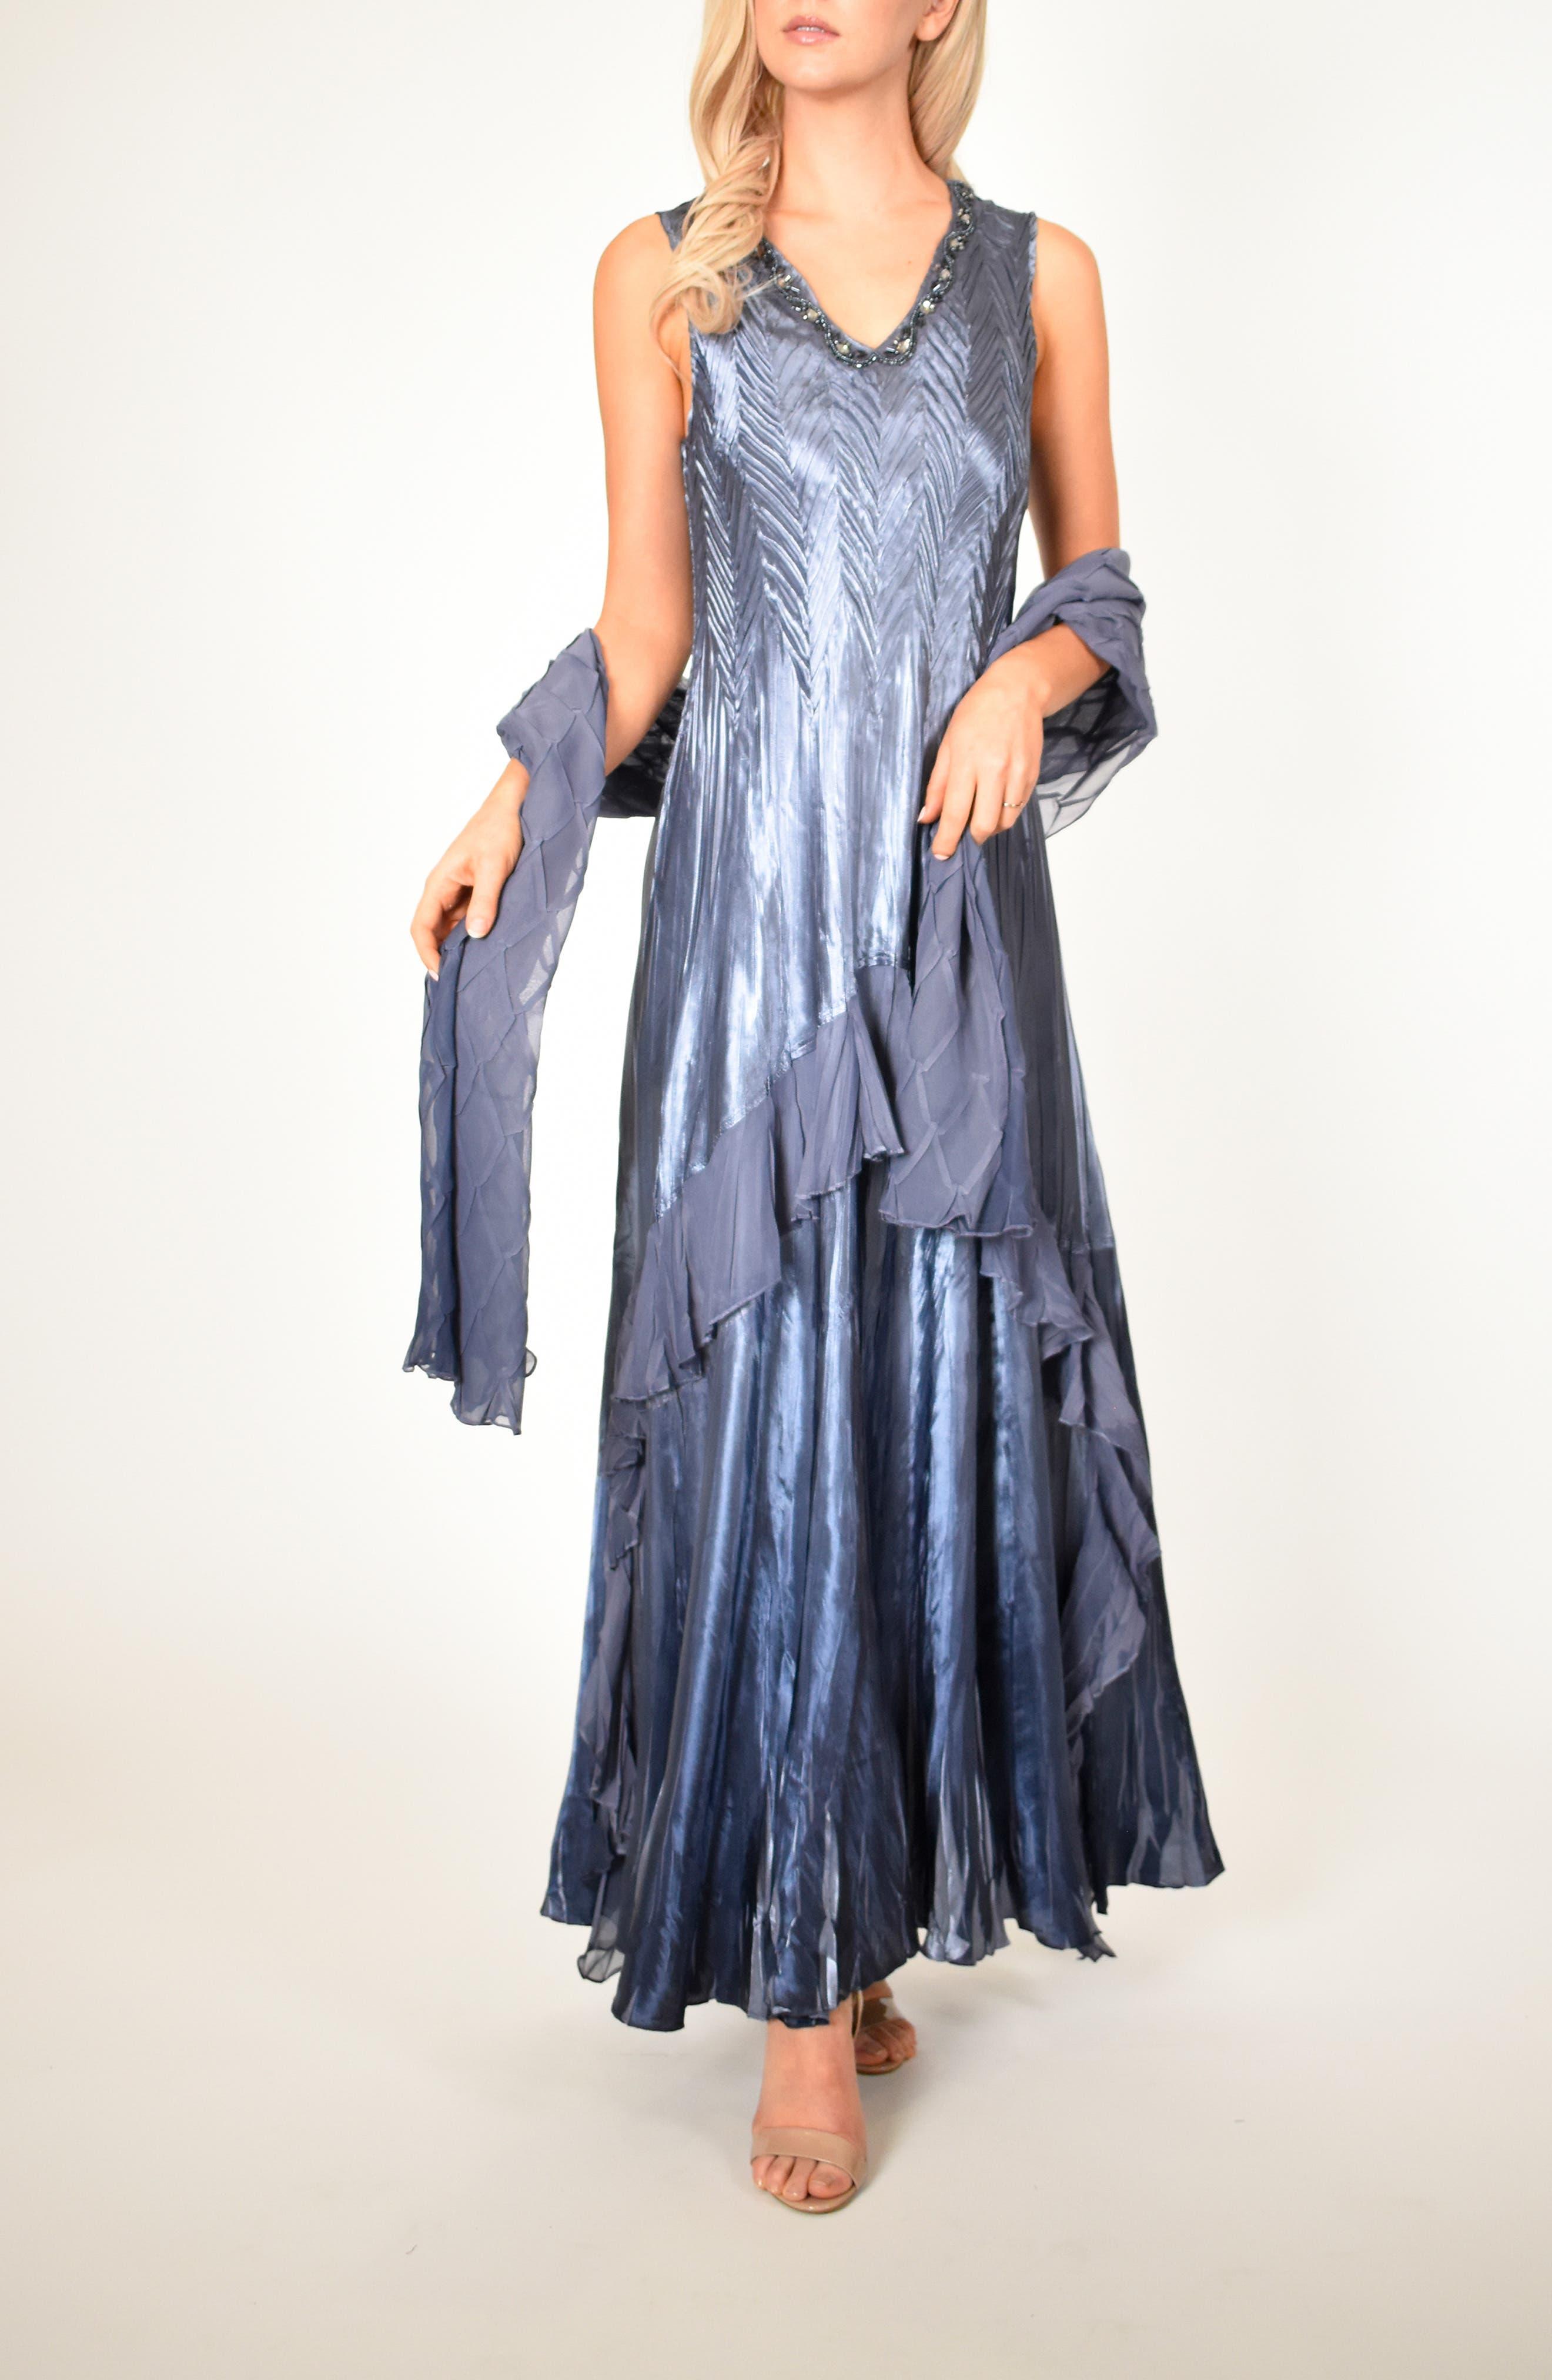 KOMAROV, Beaded V-Neck Charmeuse & Chiffon Evening Dress with Wrap, Main thumbnail 1, color, PURPLE SAGE BLUE OMBRE